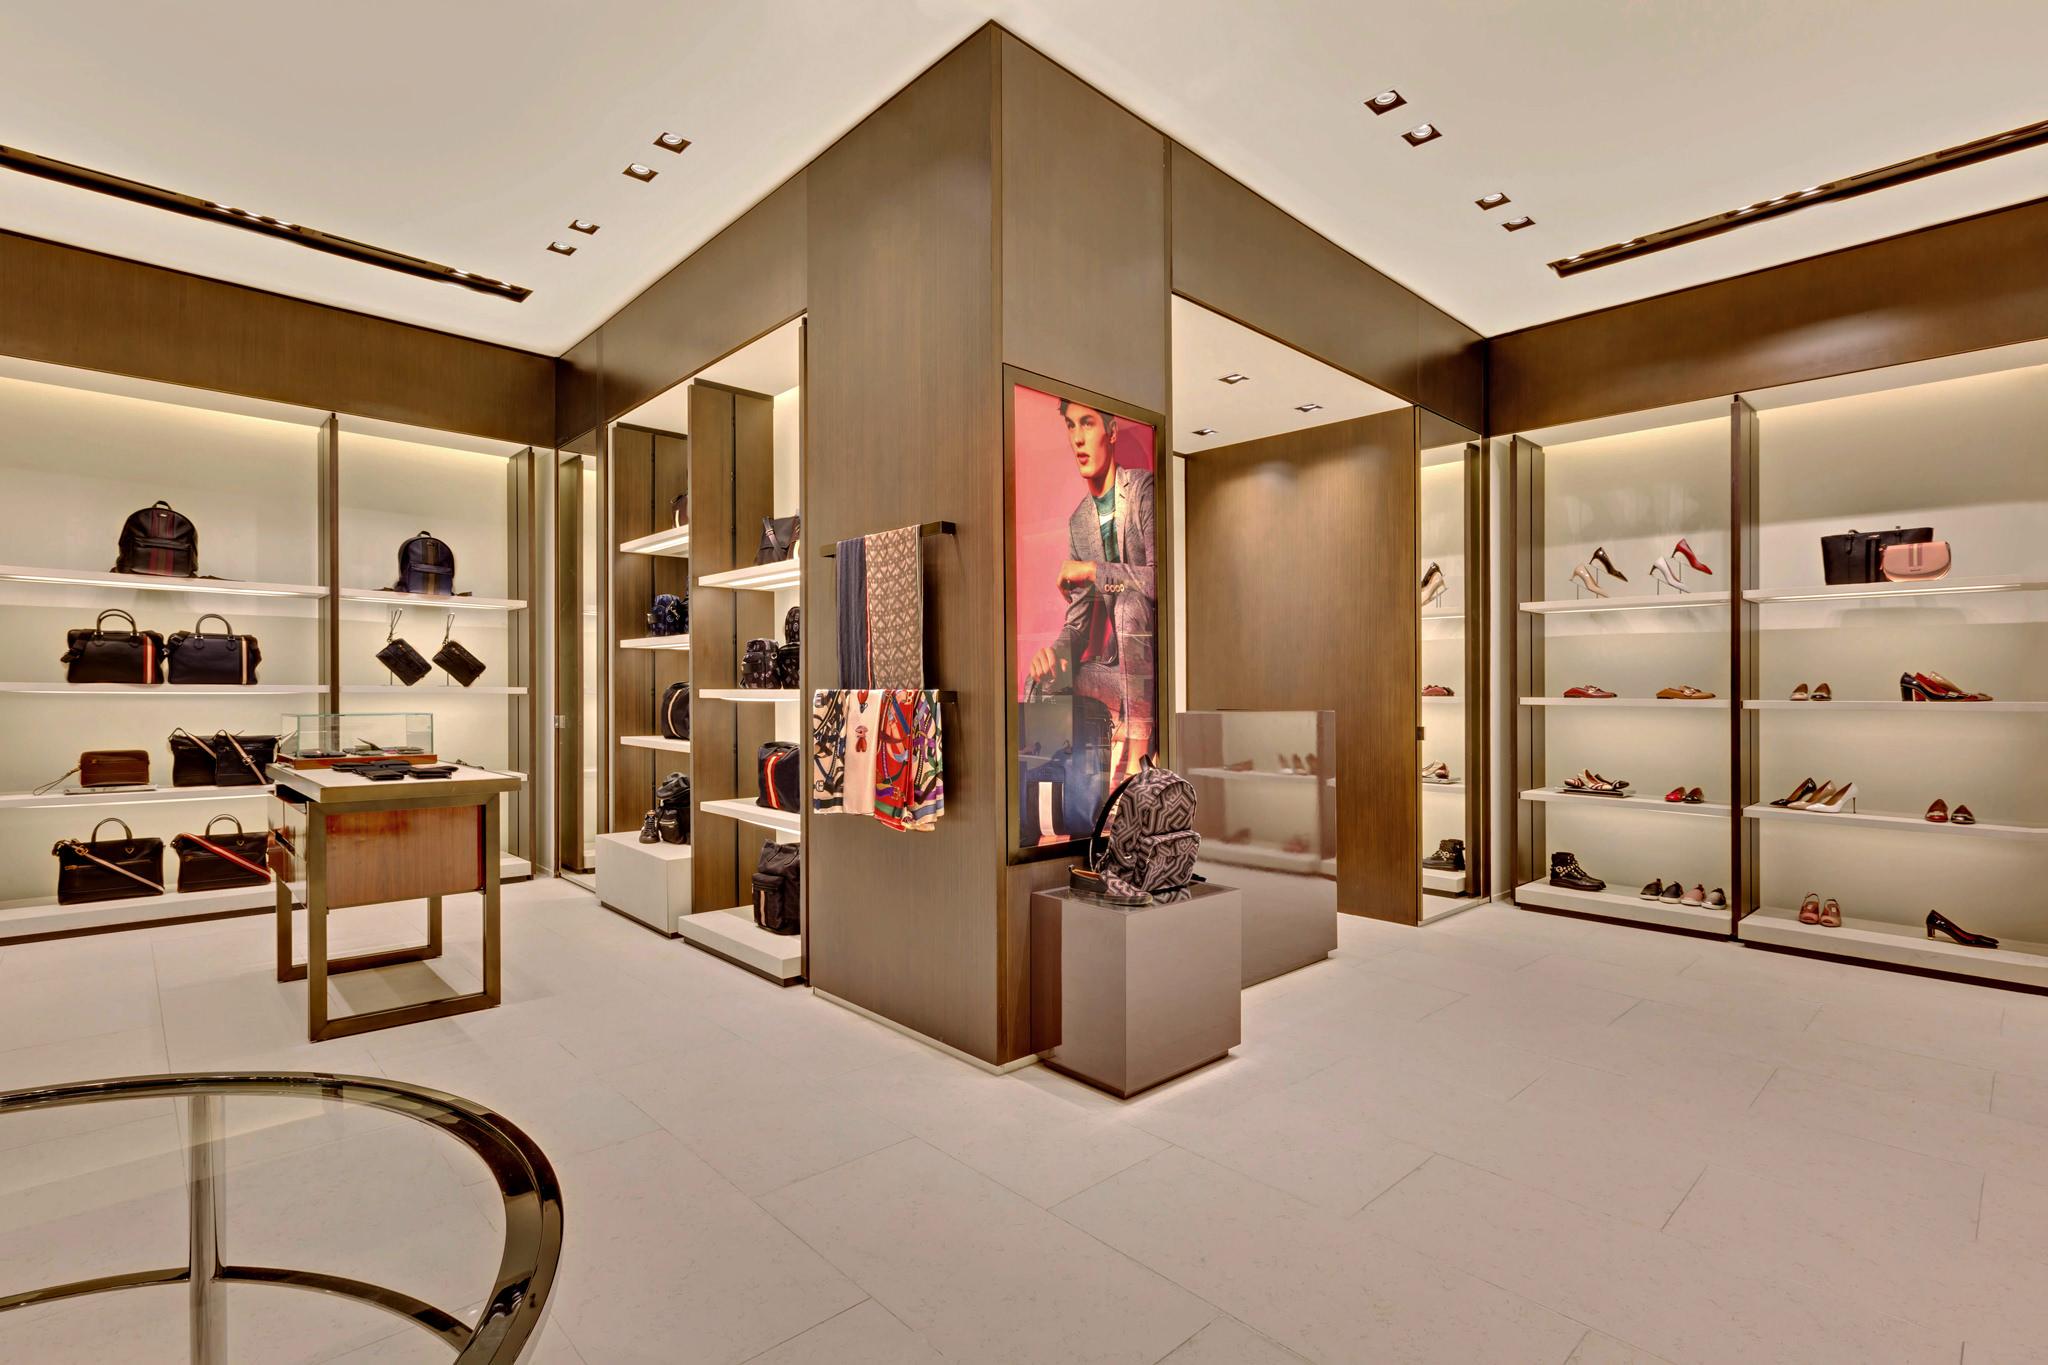 20170721 - Bally - HCM - Commercial - Interior - Store - Retouch 0015.jpg